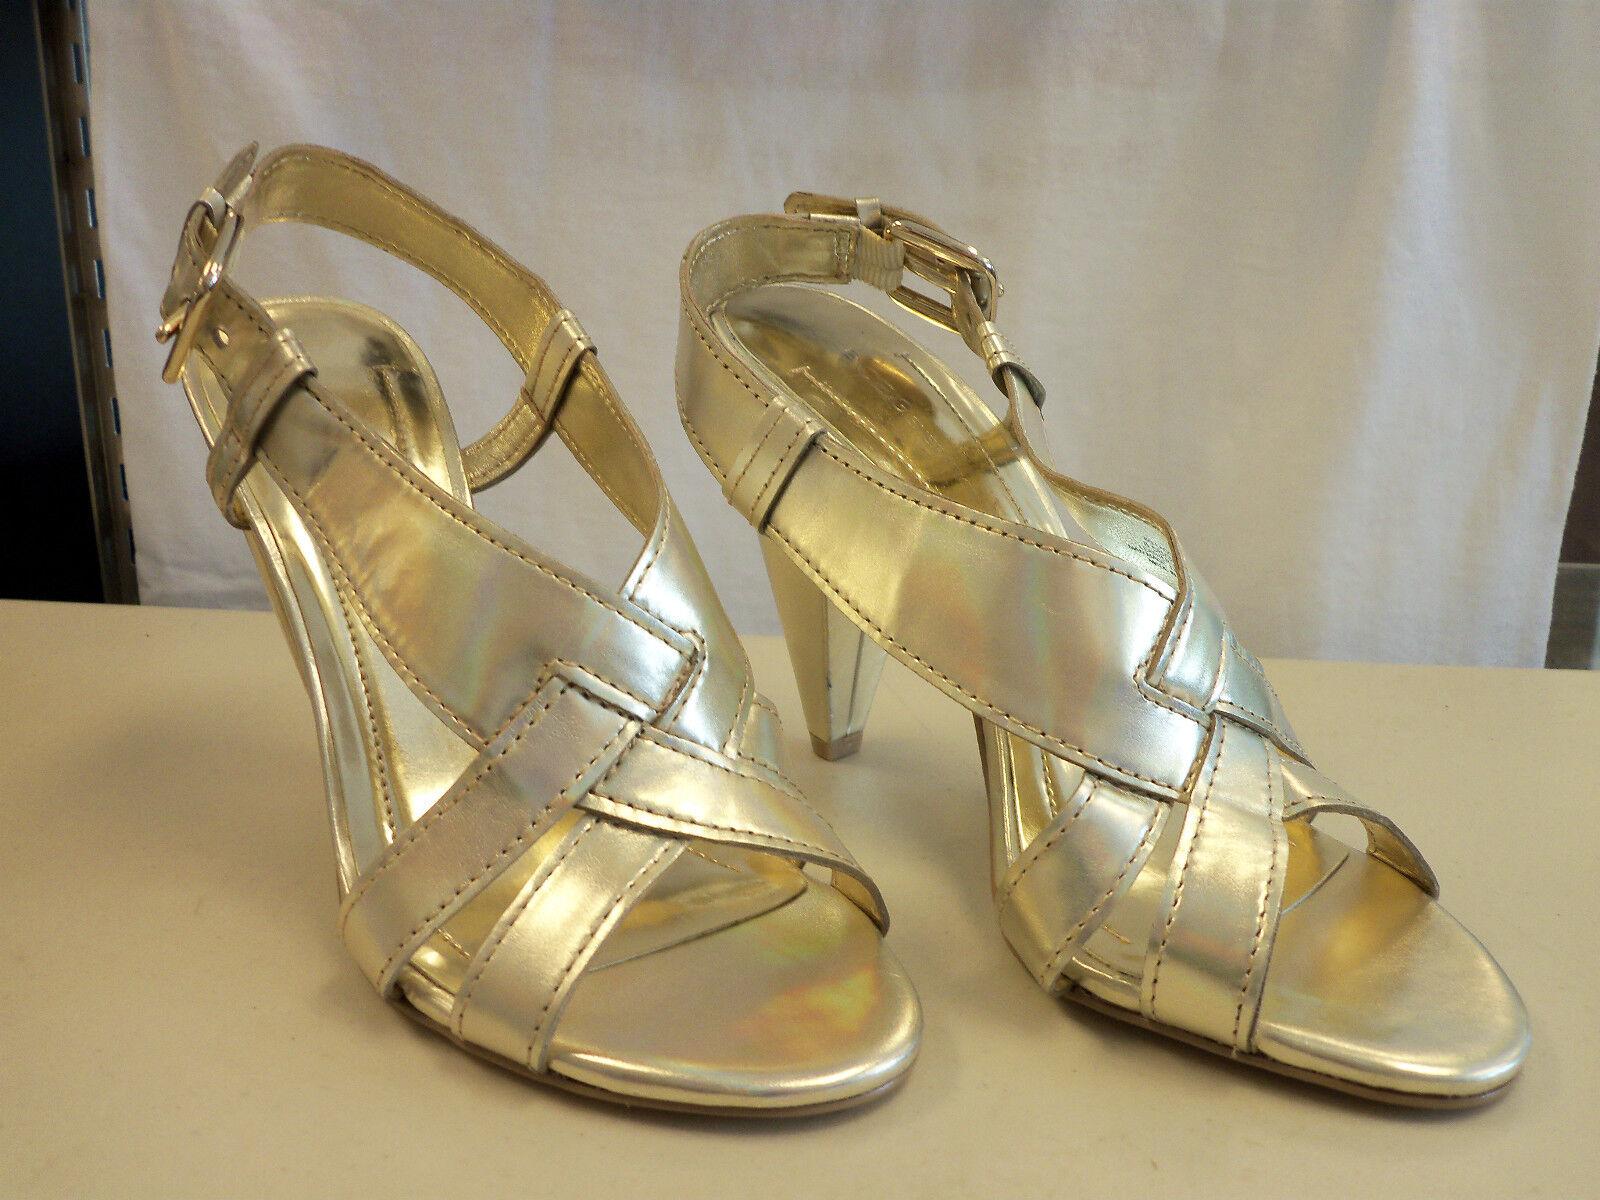 BCBG Generation NEU Store Display Model Damenschuhe Laggo Gold Heels 8.5 M Schuhes